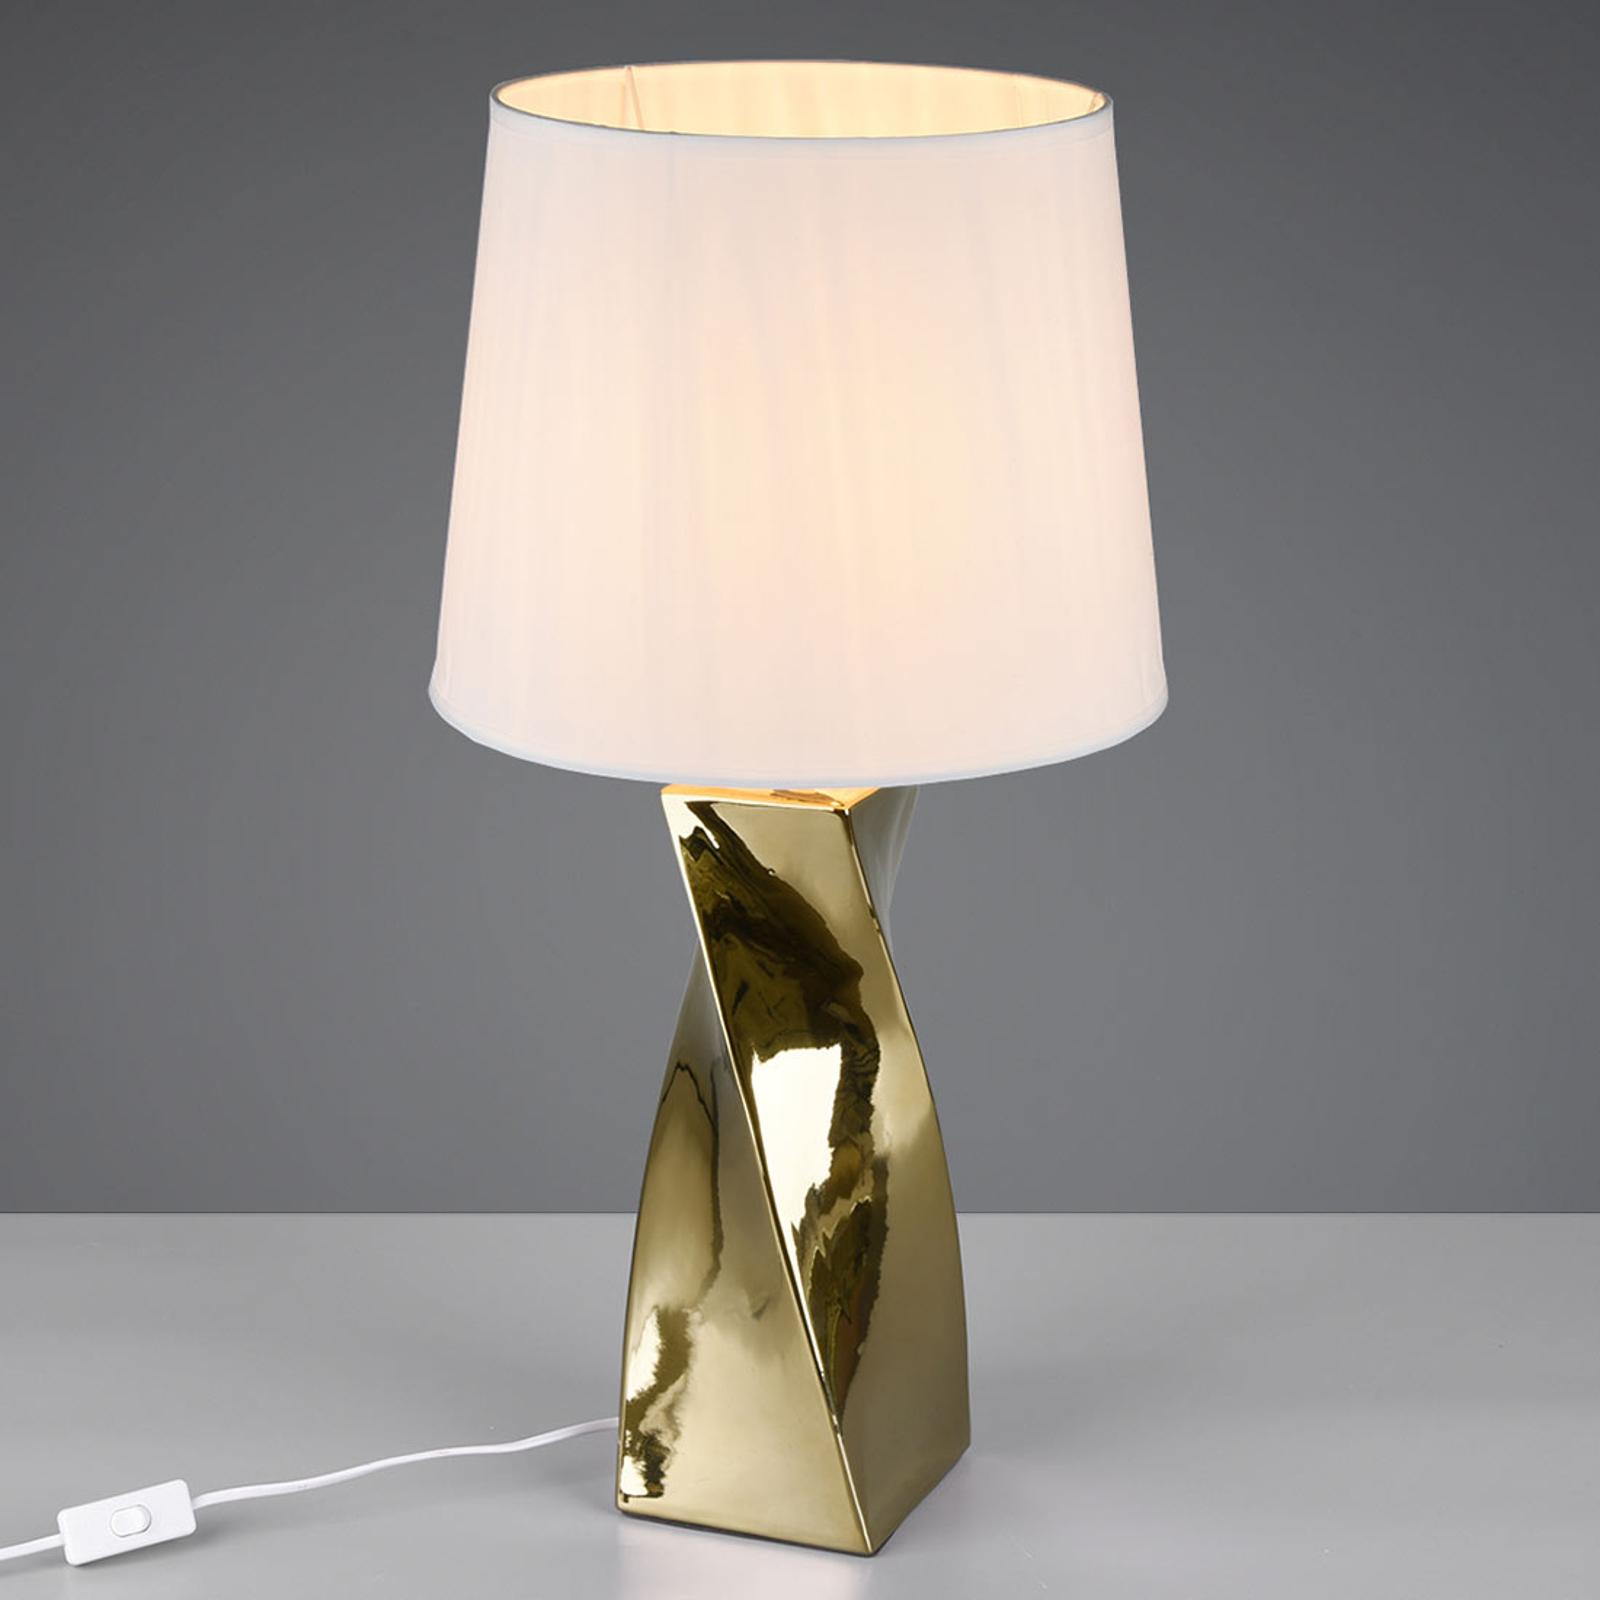 Lampe à poser Abeba, Ø 34cm, blanc-doré